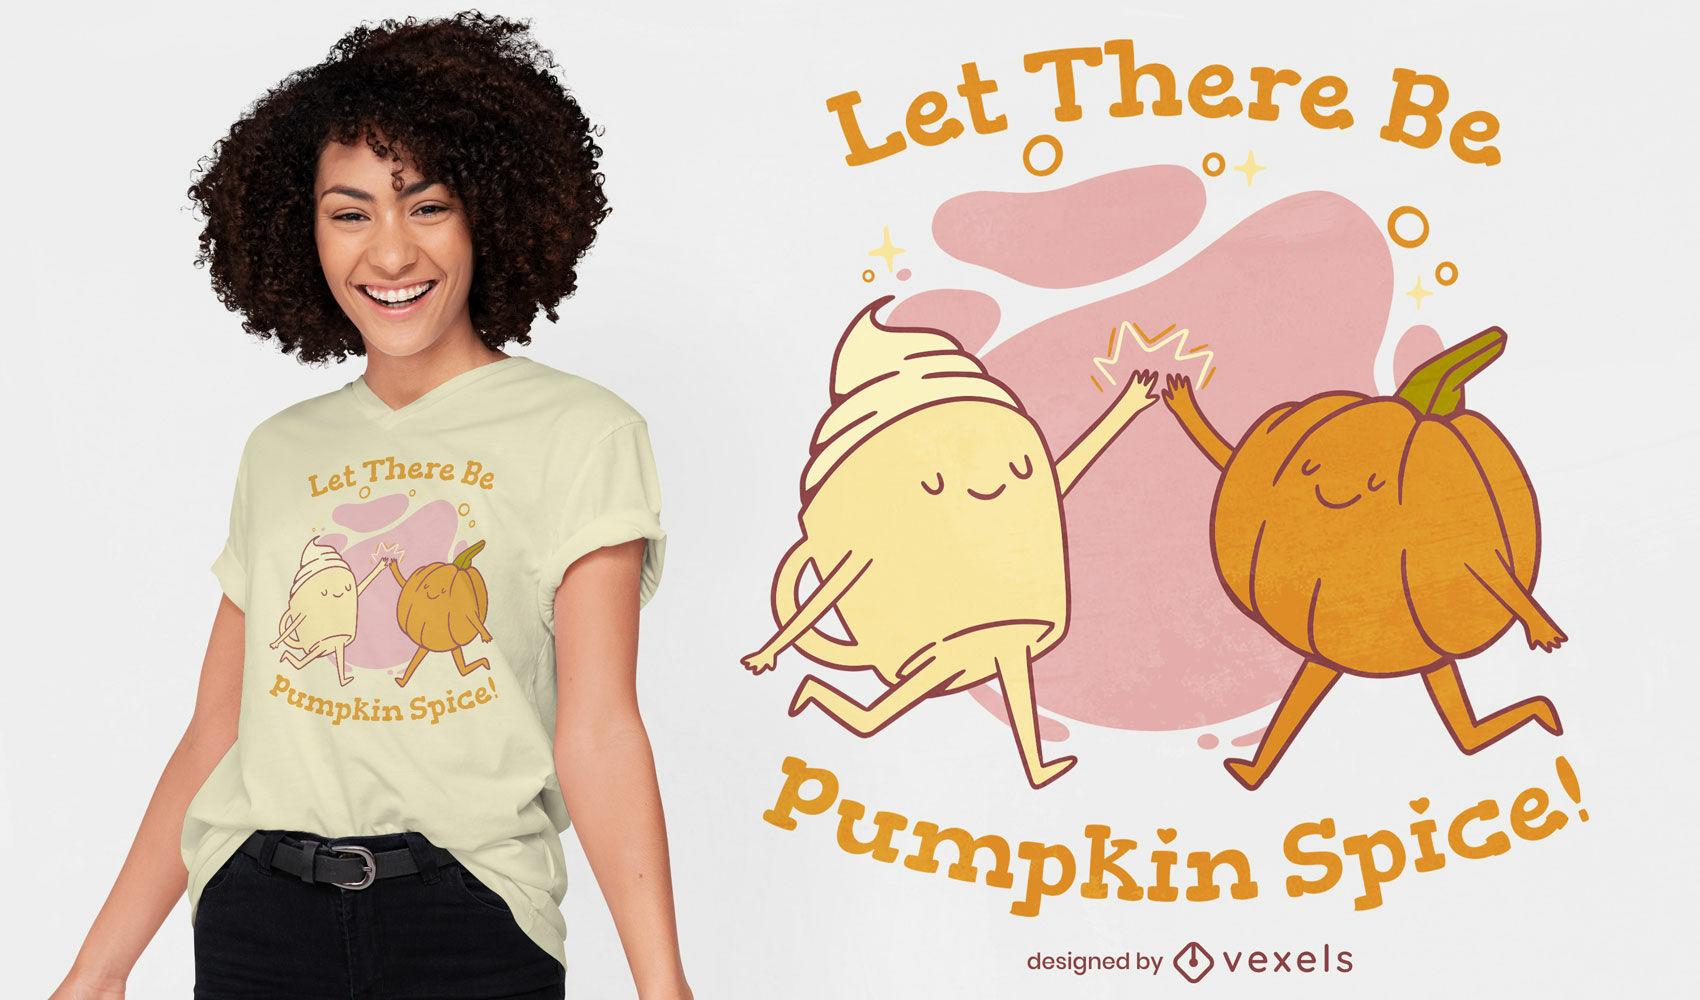 Cute pumpkin spice t-shirt design